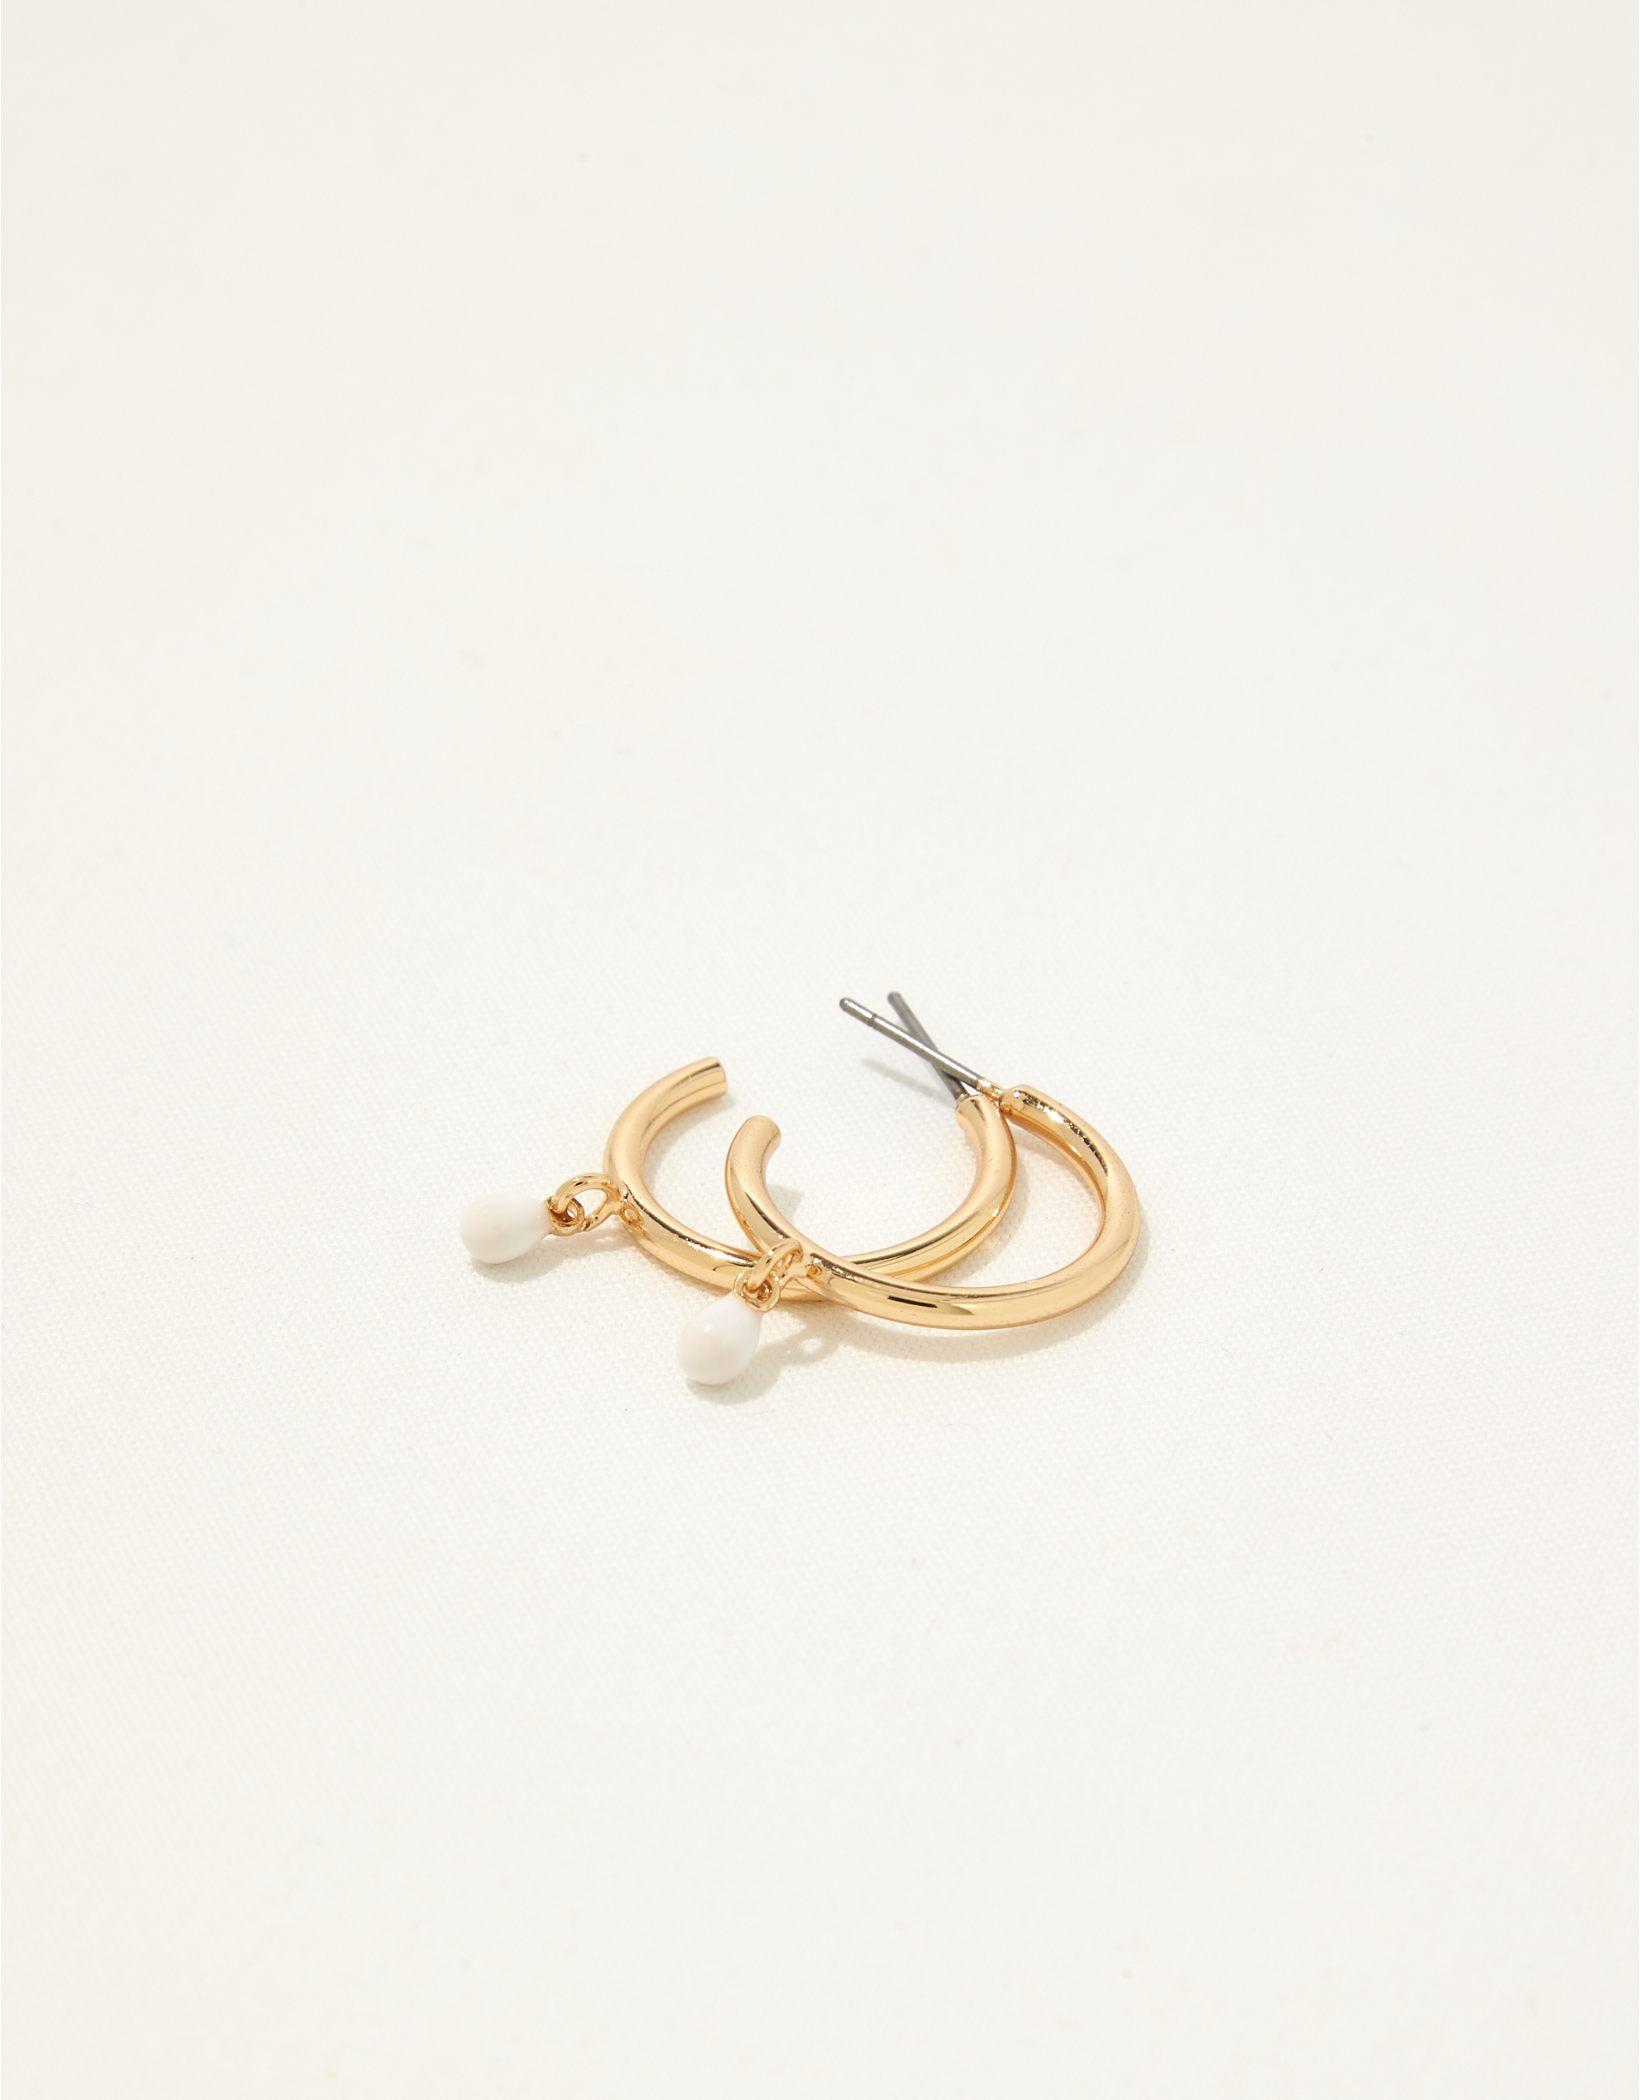 Aerie Resin Teardrop Earrings